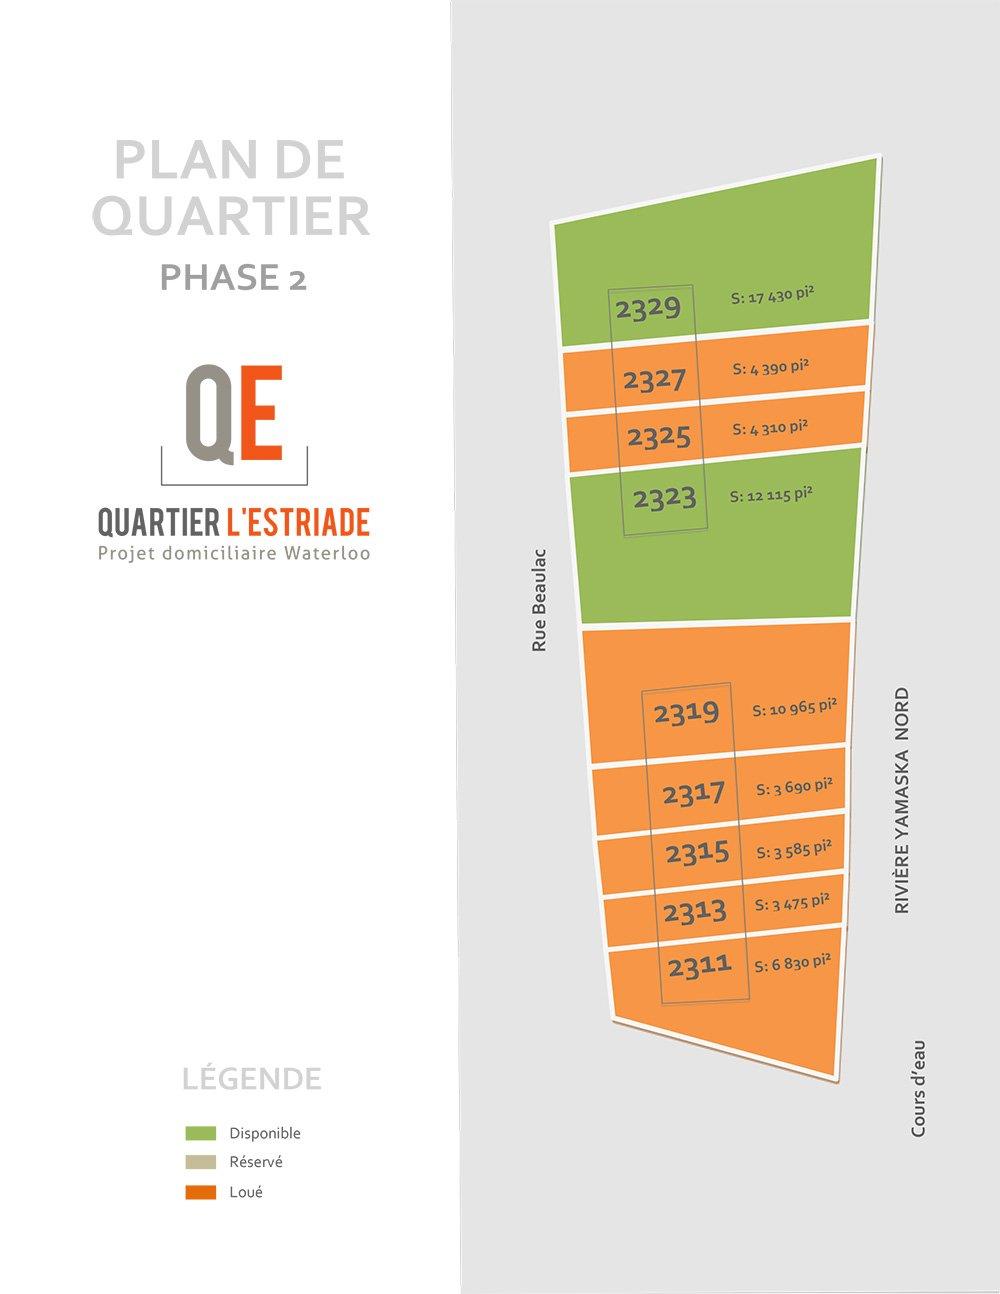 Plan du Quartier de l'Estriade Pahse 2